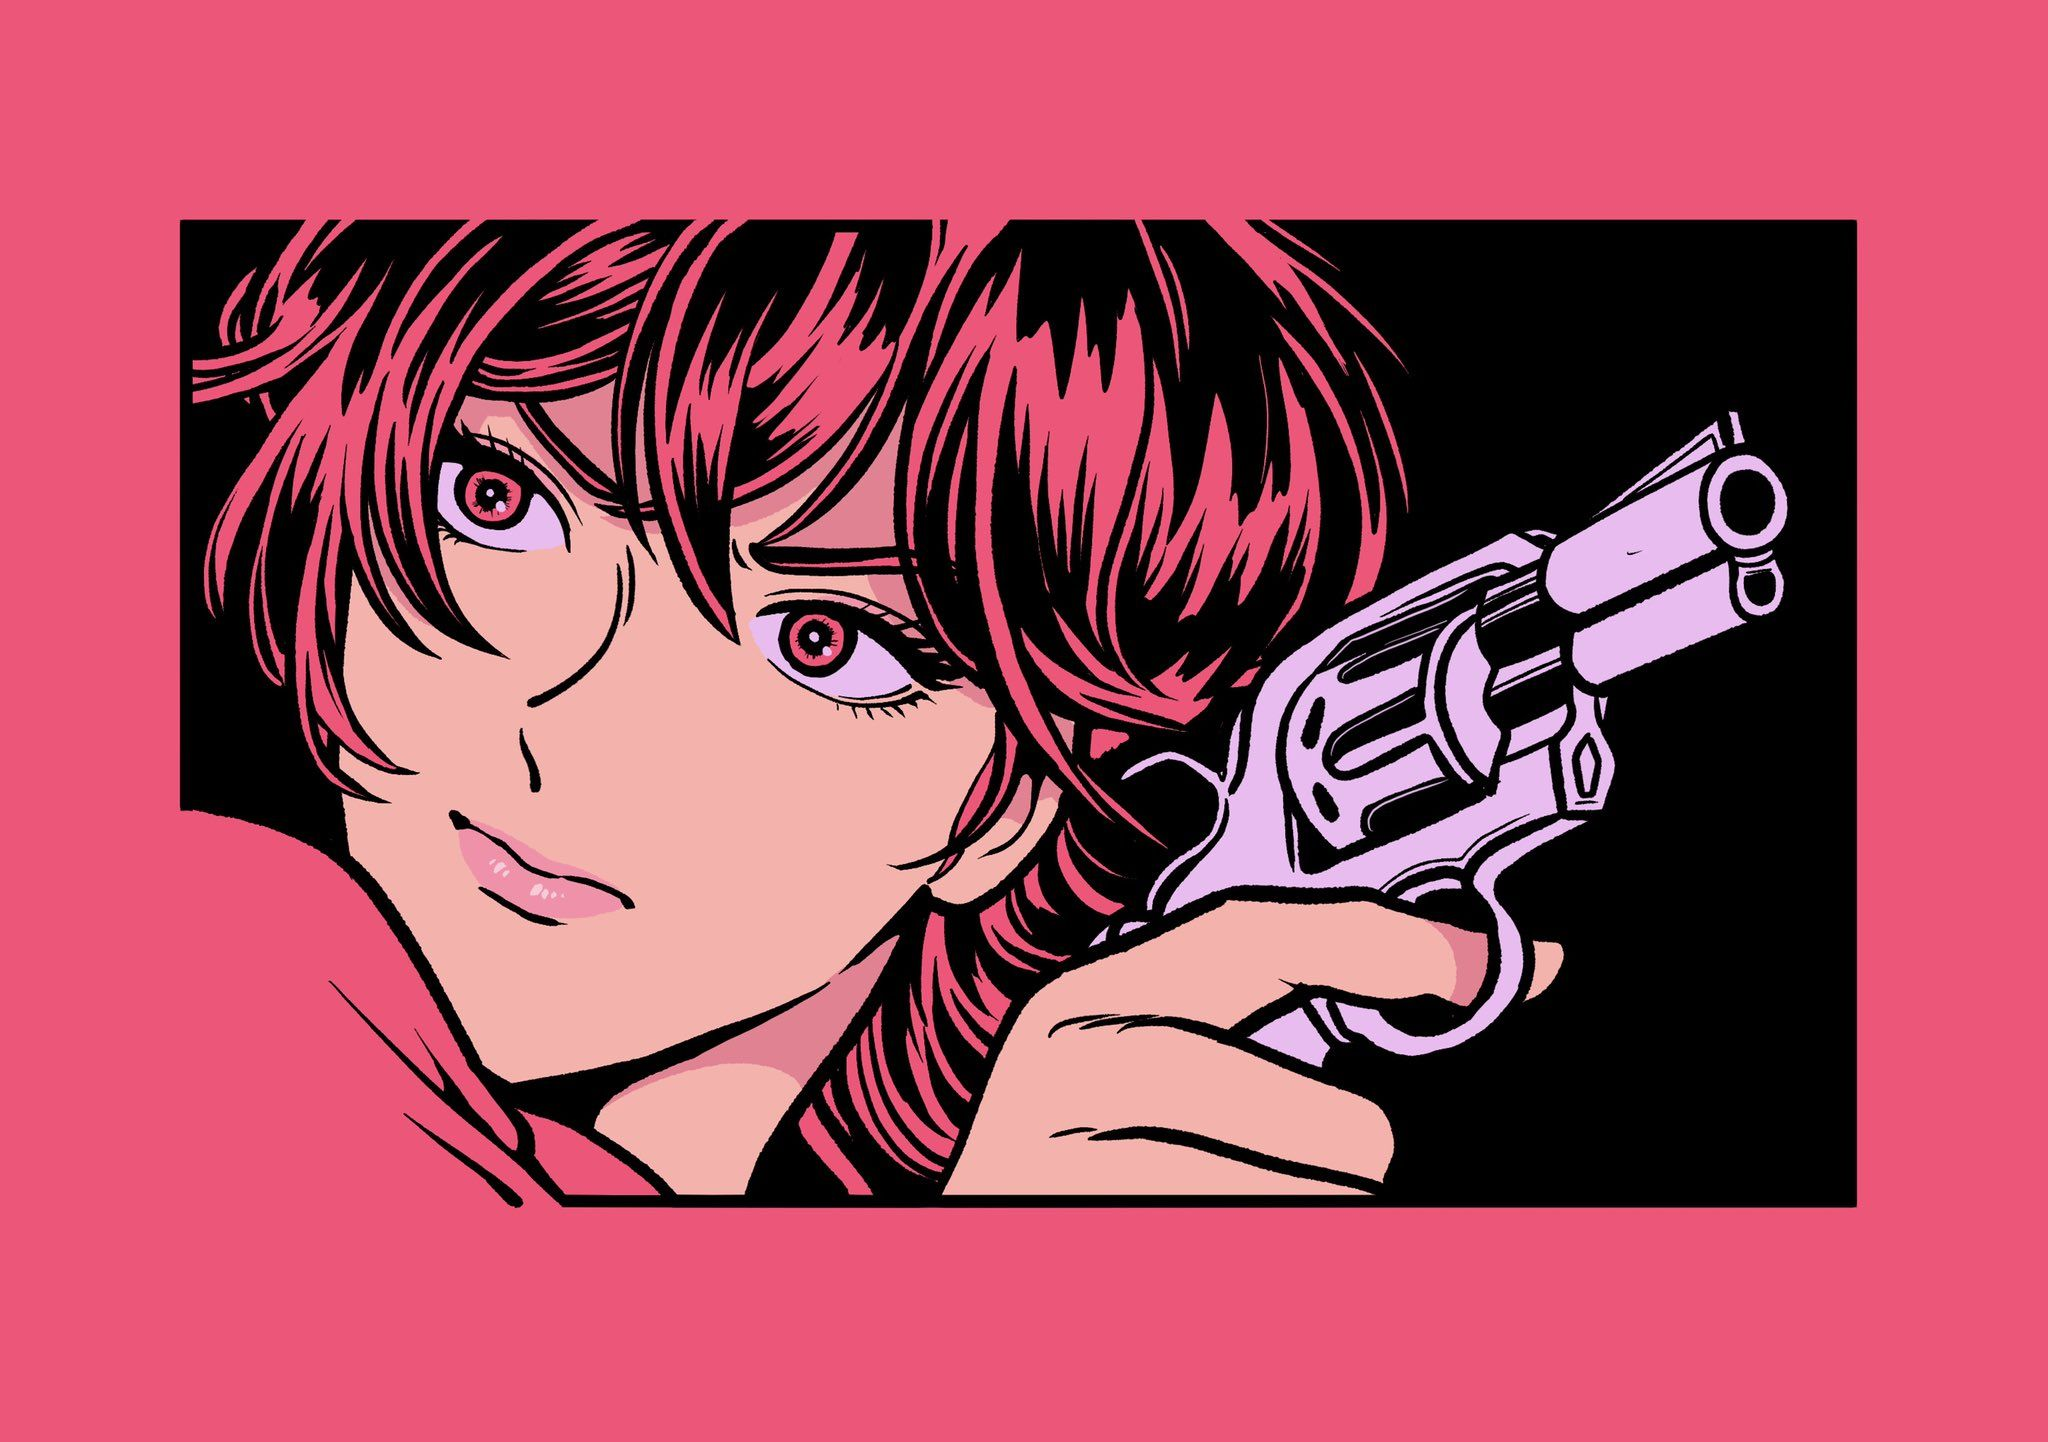 kamin on Twitter in 2020 Illustration, Anime, City hunter